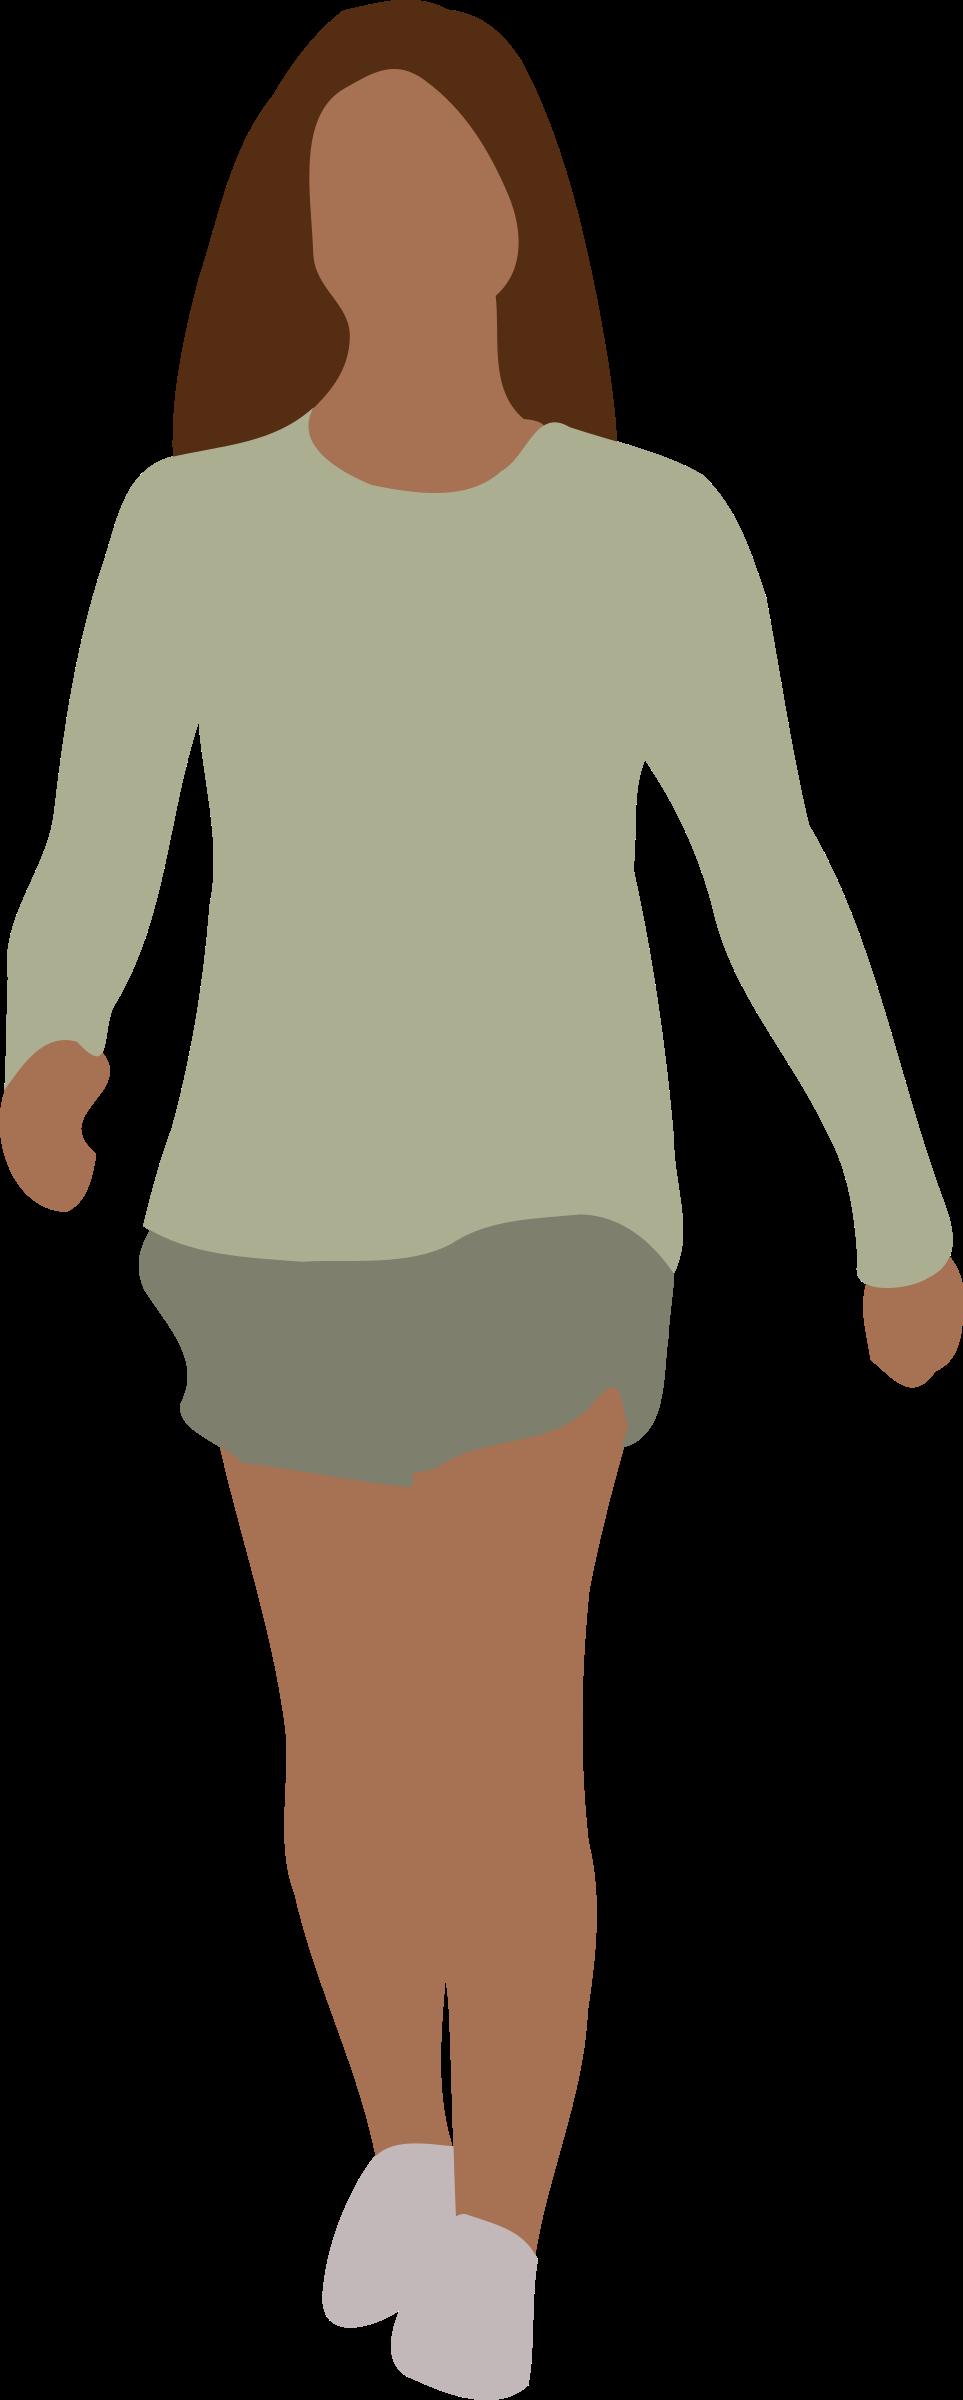 Lady clipart transparent. Faceless woman walking big